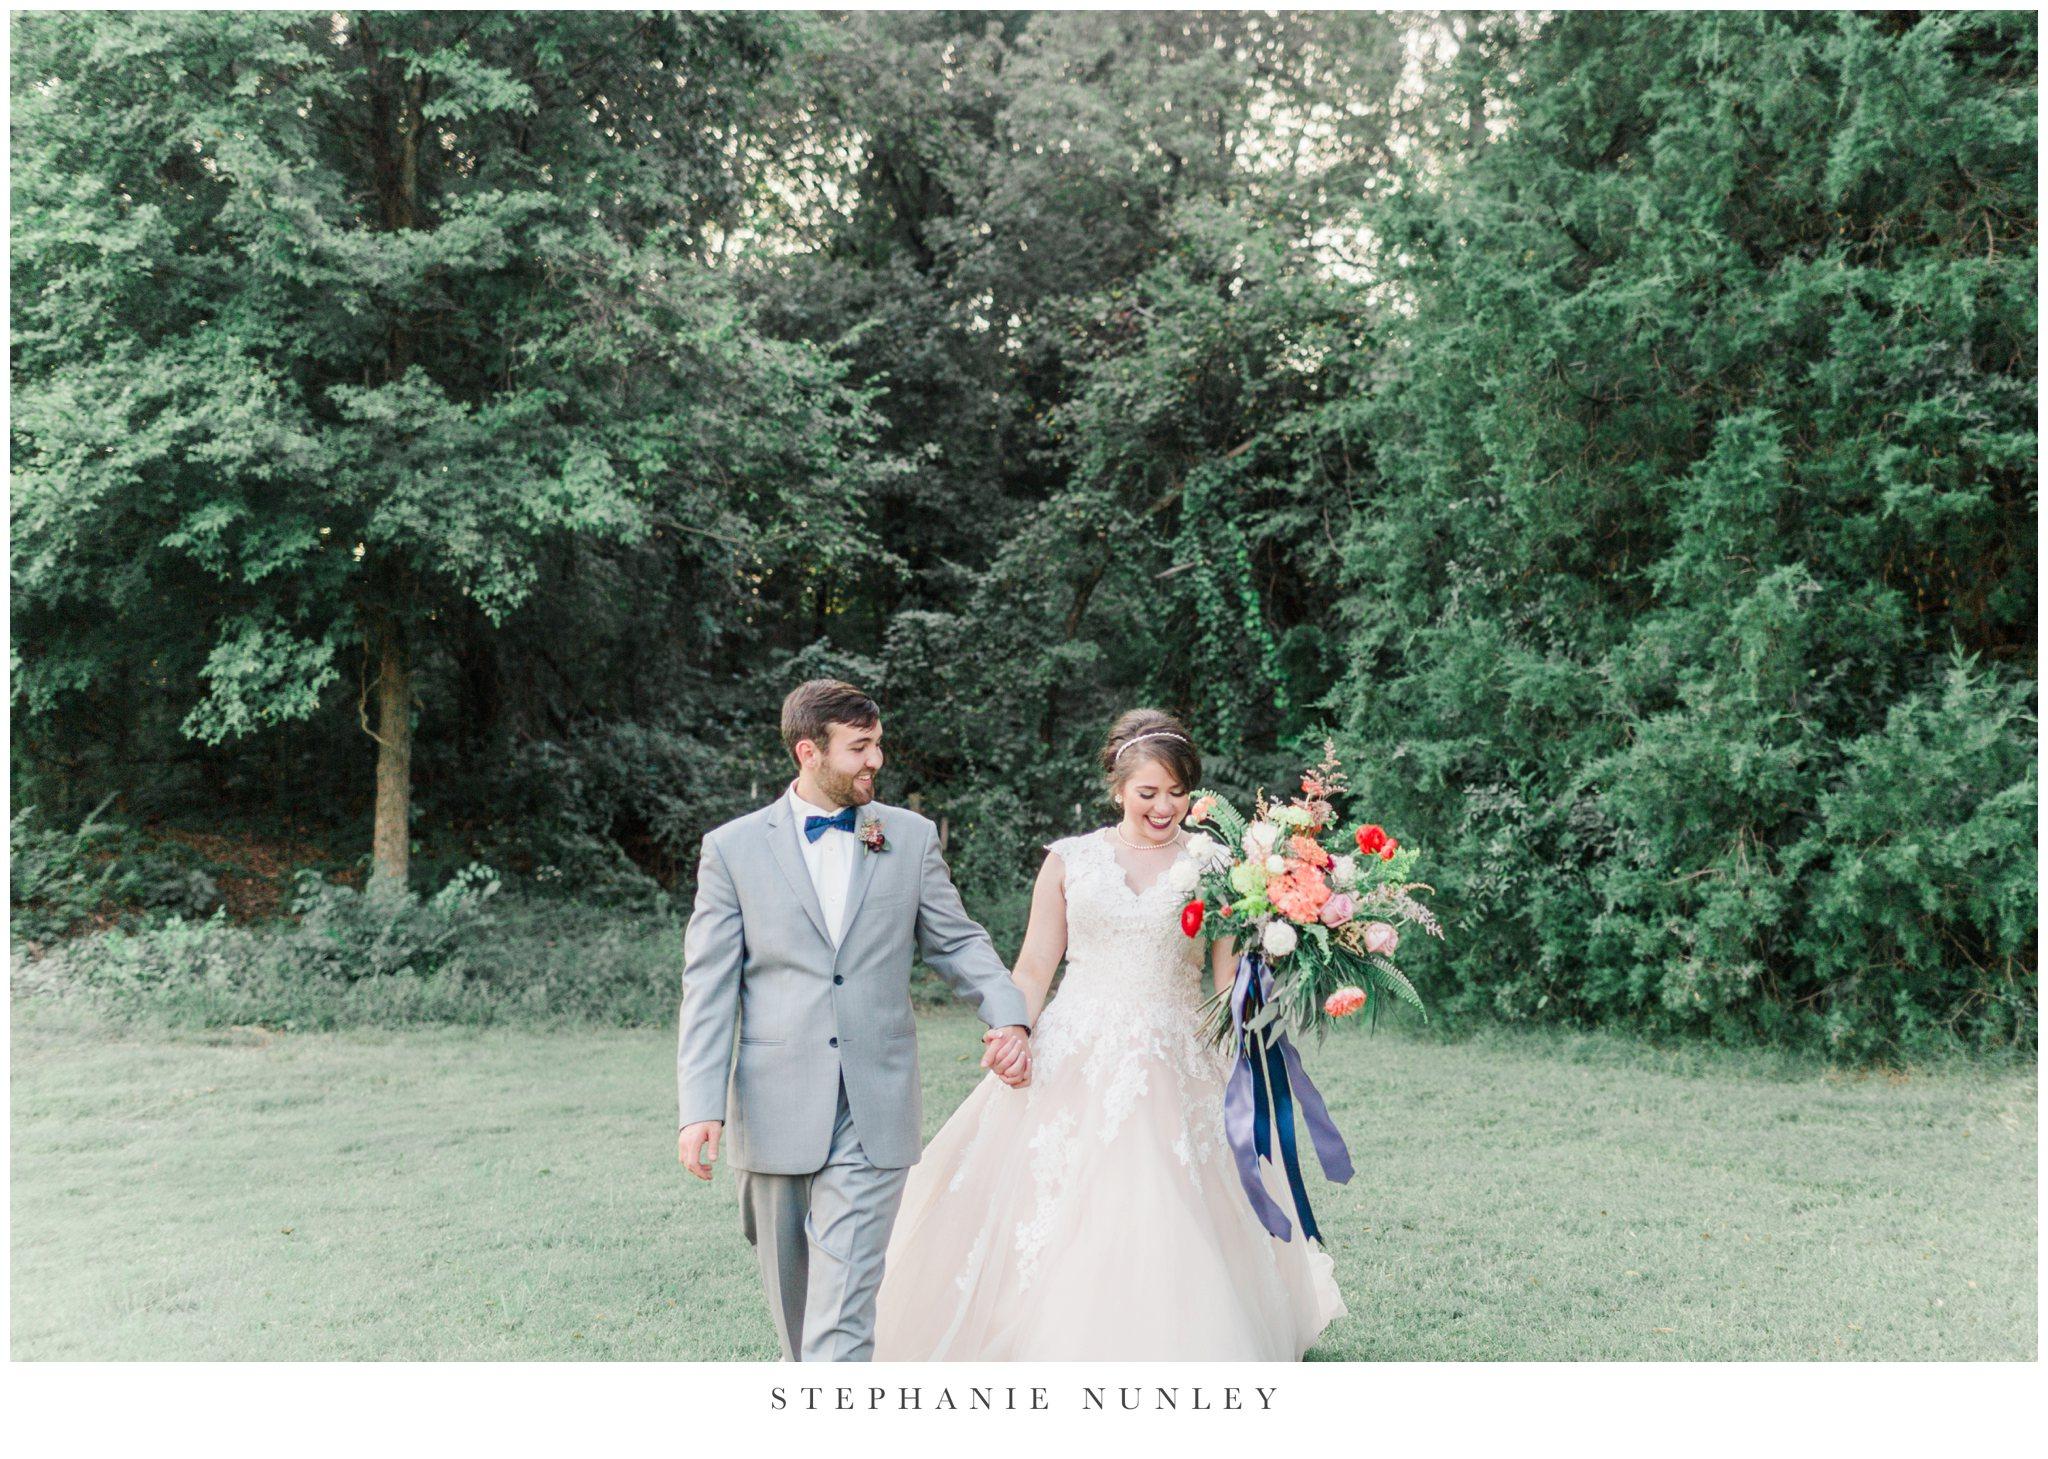 arkansas-wedding-with-lush-wildflower-bouquet-0128.jpg